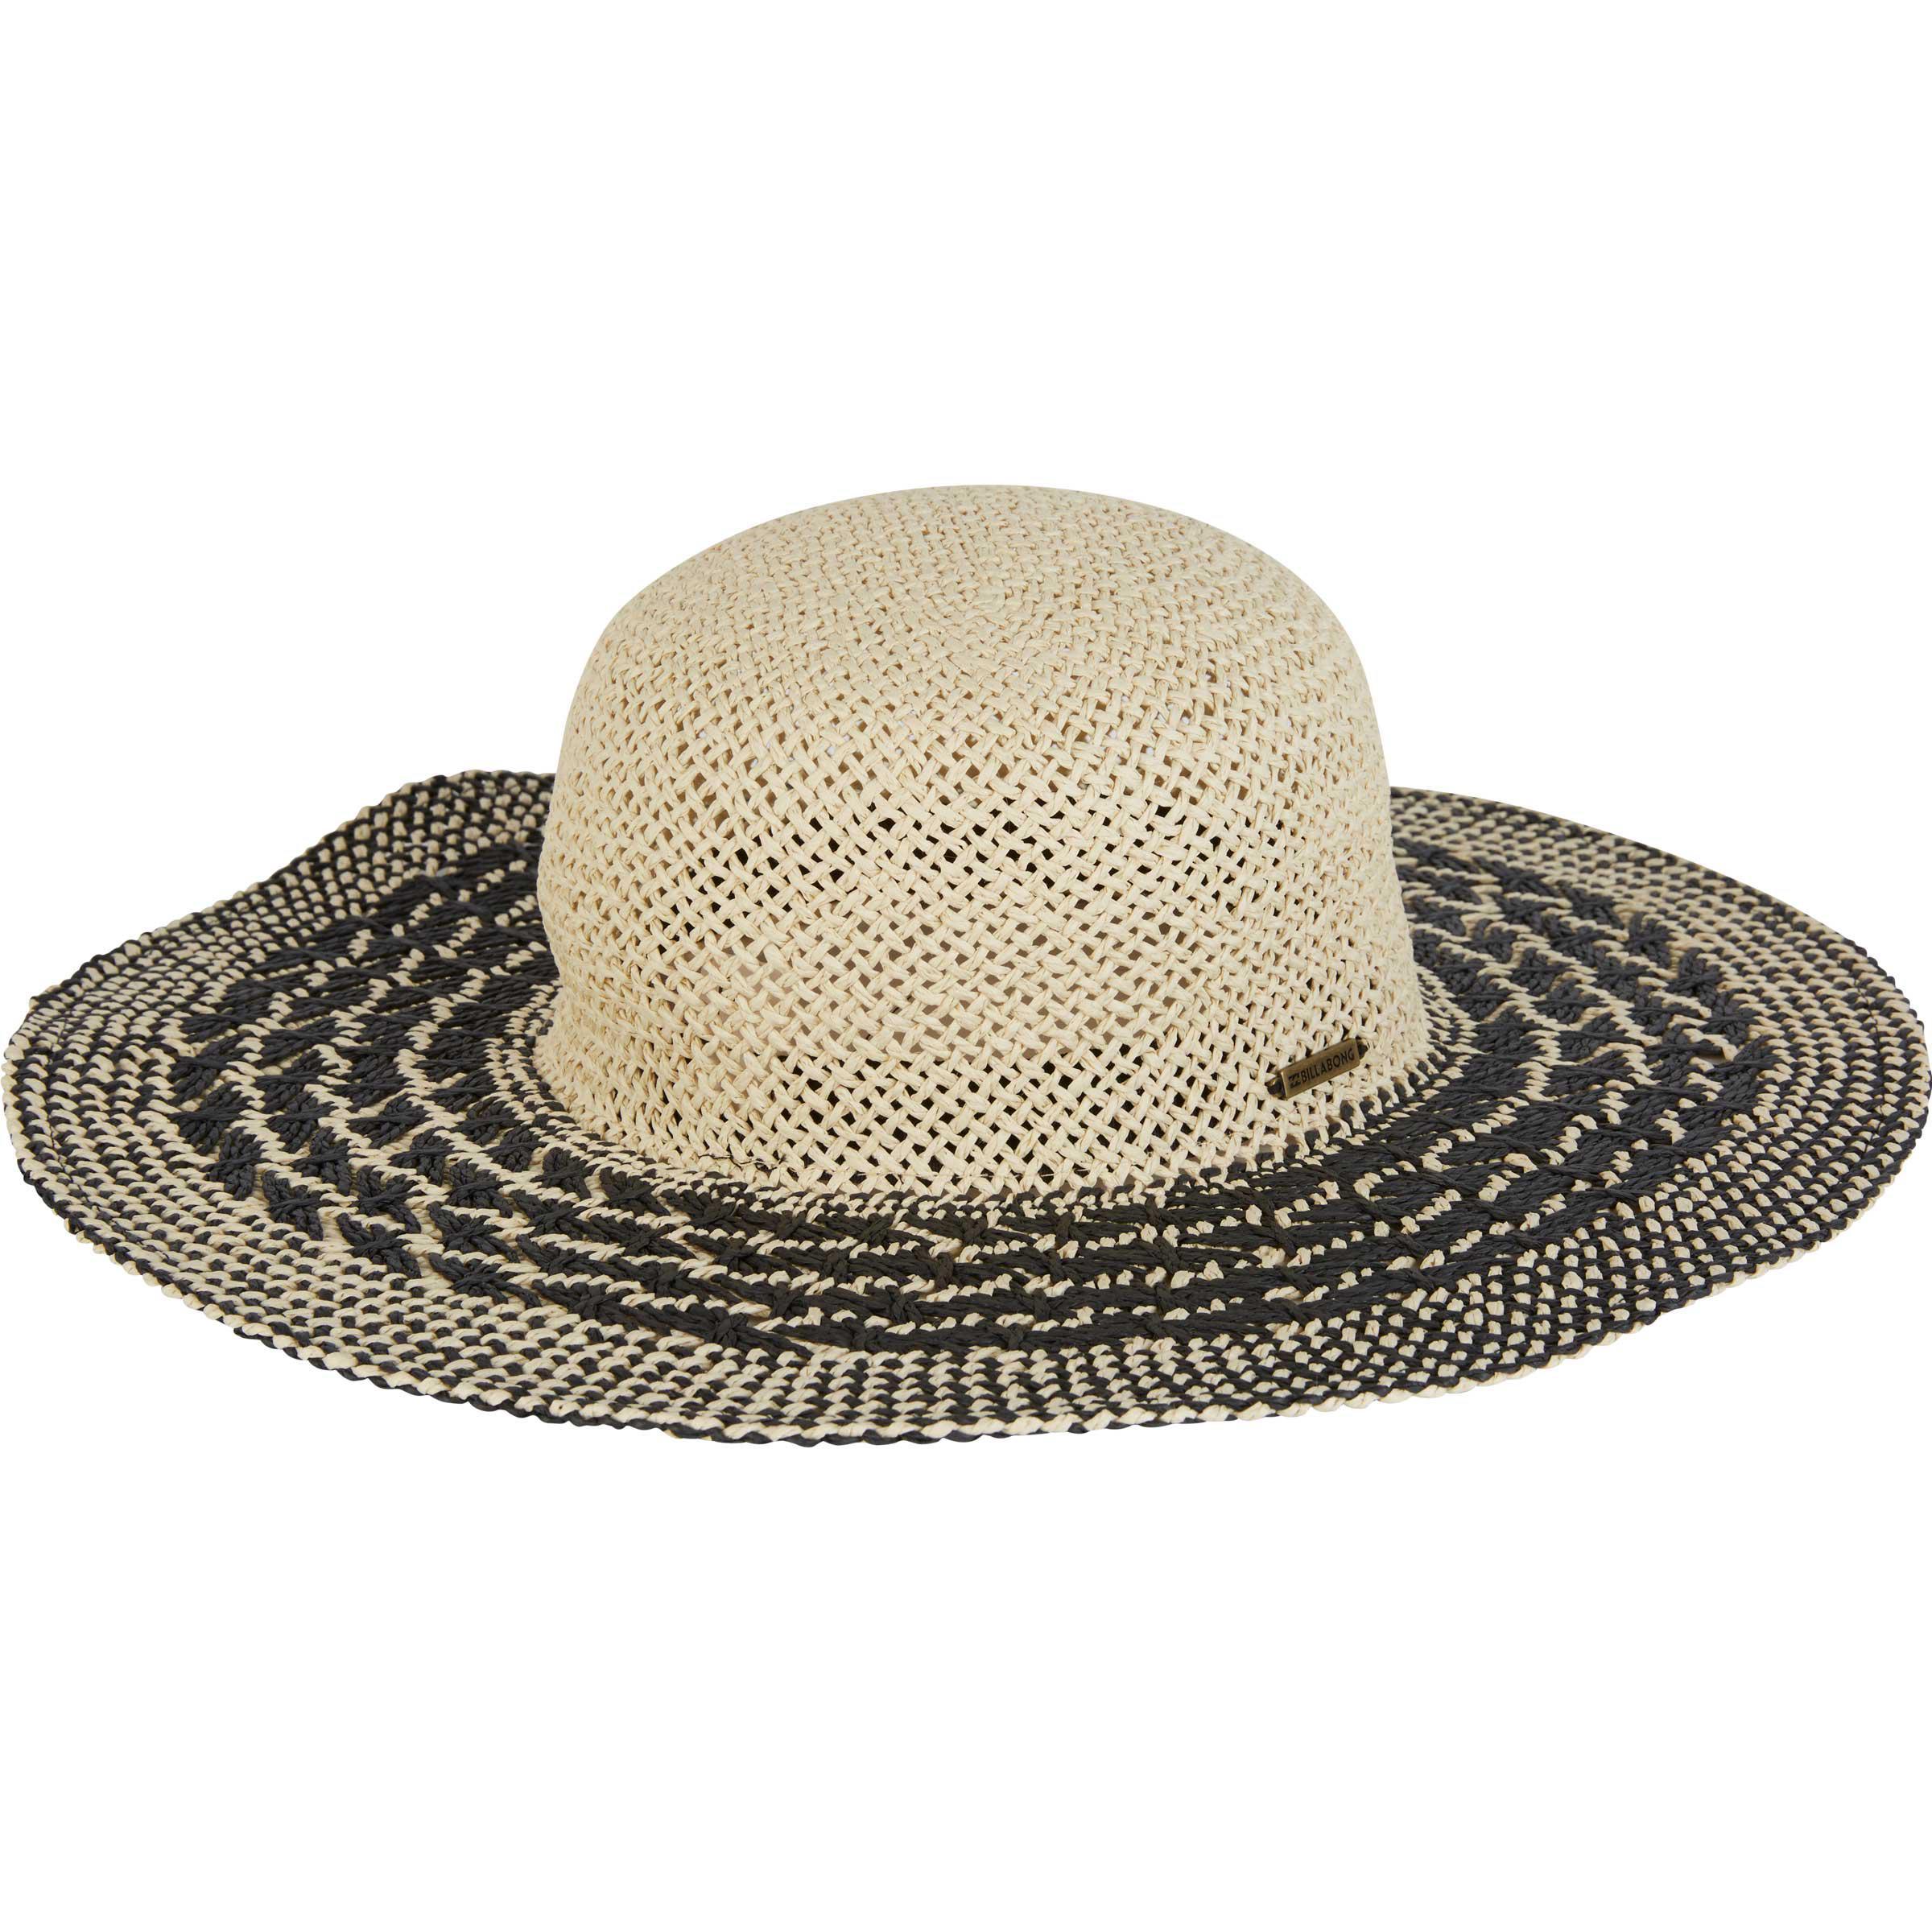 75d6bbfc4b695 ... coupon for billabong off black chasing the sun hat jpg 2400x2400  billabong cabana hat 0824b a65c6